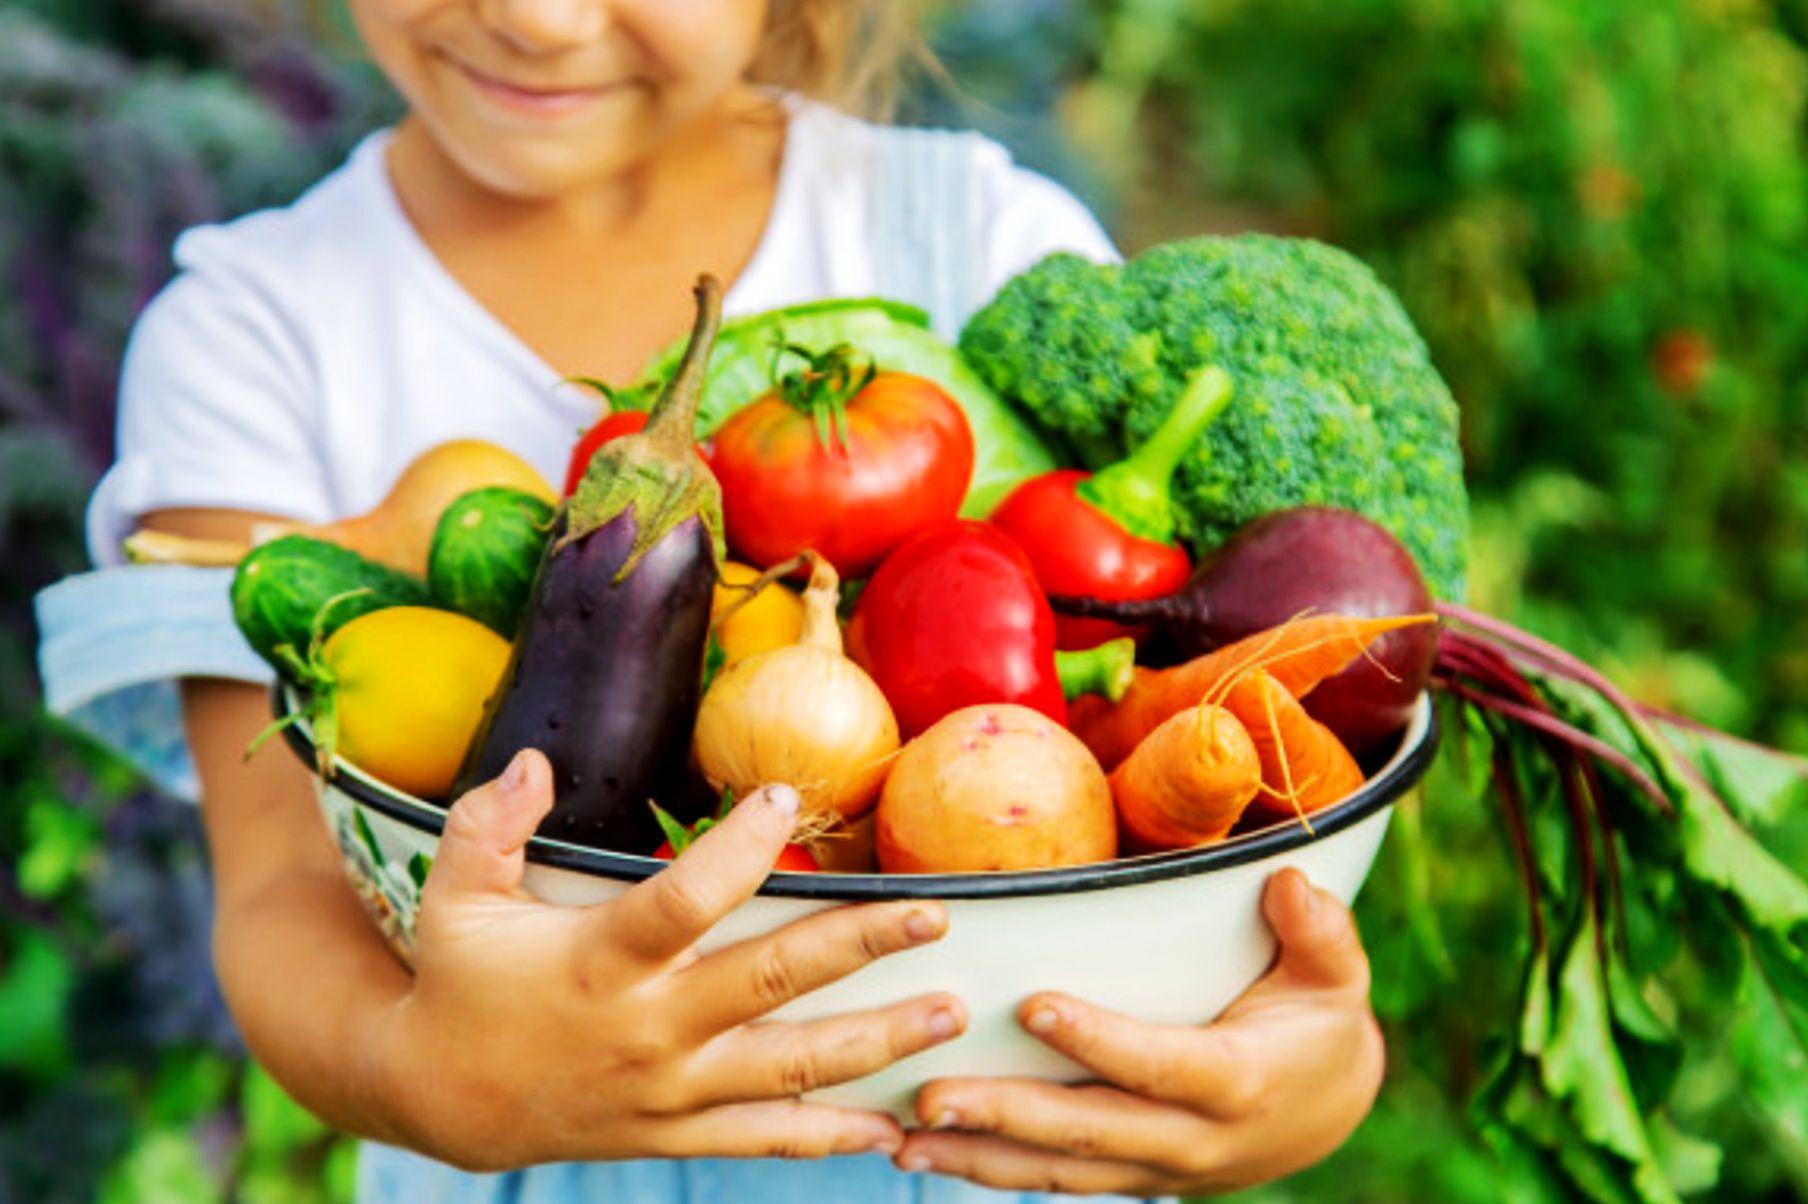 blog-fruit-and-vegetables-for-children